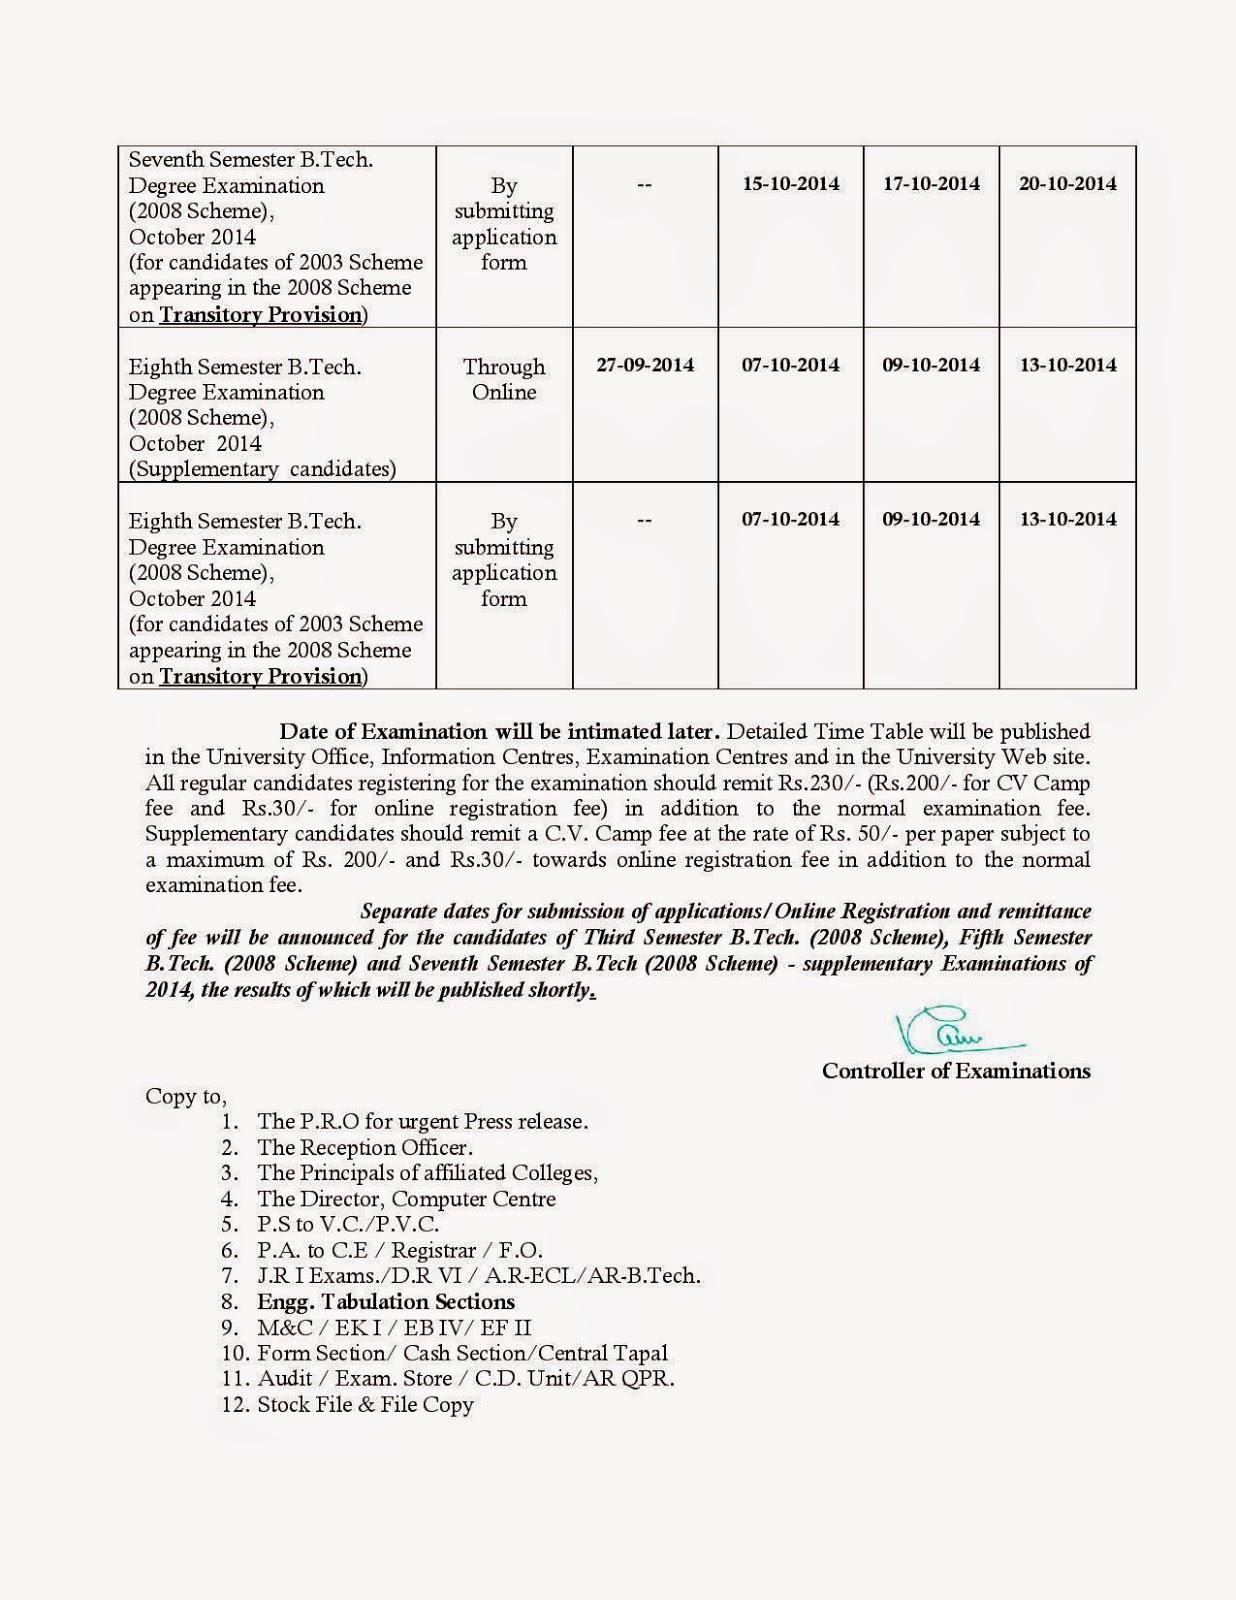 Kerala University B.Tech Notification  Combined First & Second -Third - Seventh - Eighth - B.Tech. Degree Examinations, October-November 2014